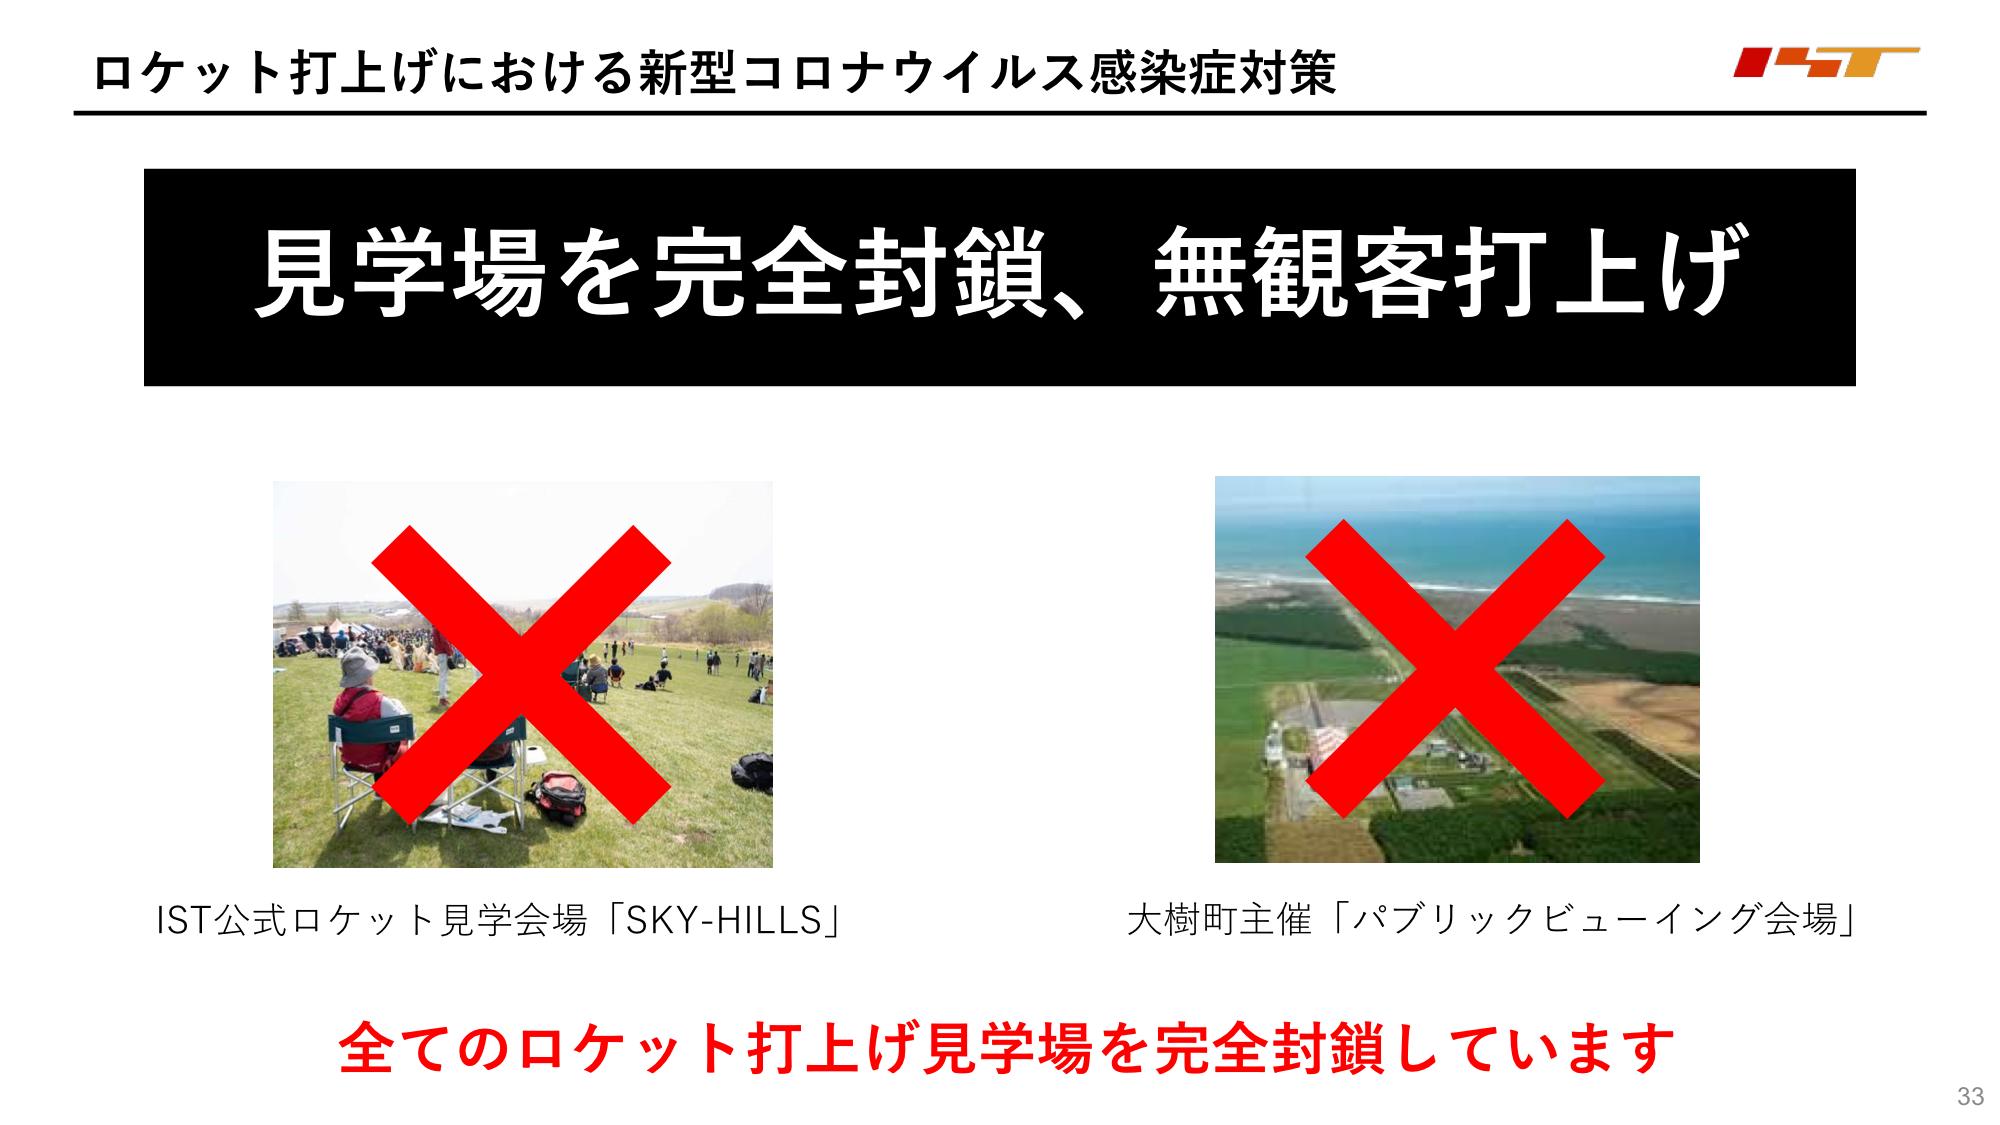 f:id:Imamura:20200603232957p:plain